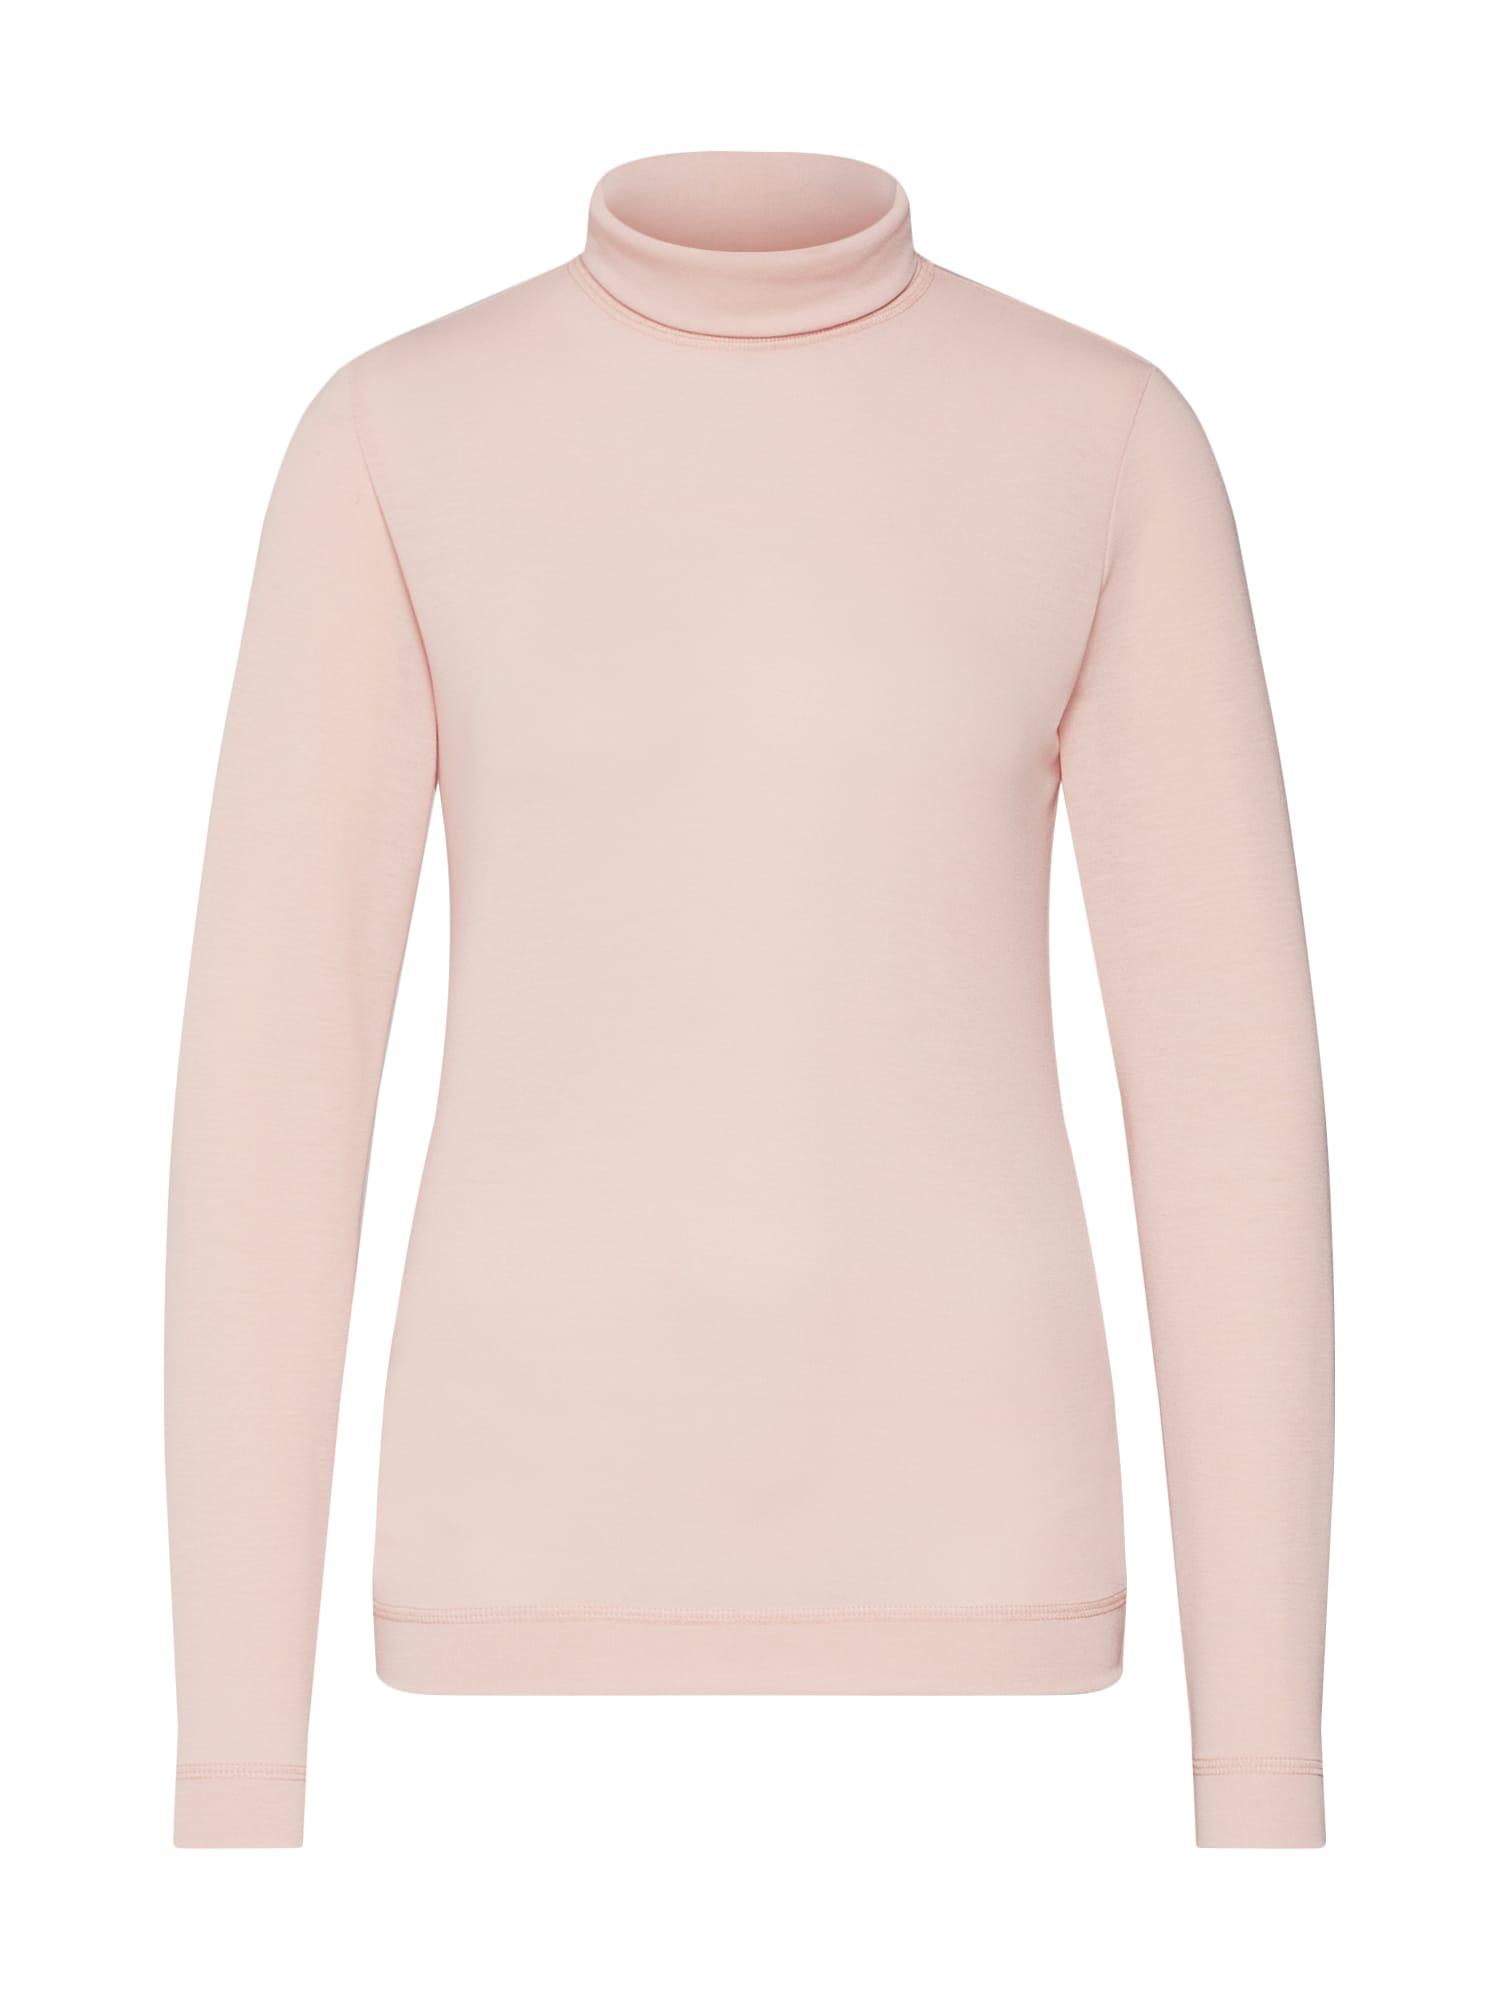 Shirt | Bekleidung > Shirts > Sonstige Shirts | Vila